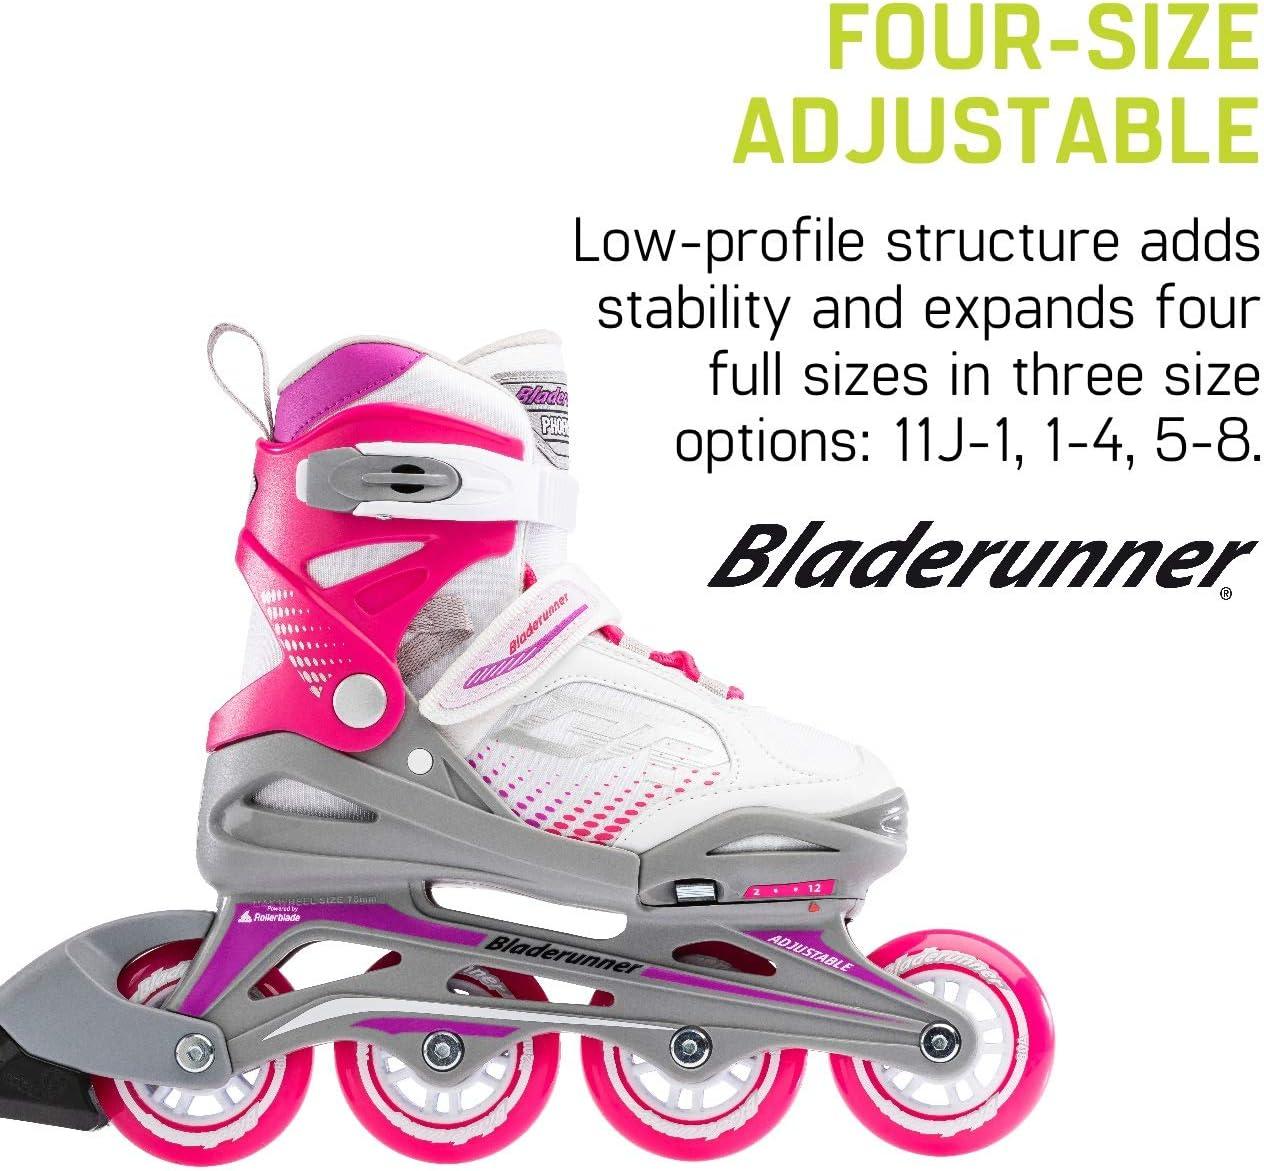 Value Performance Inline Skates Junior Bladerunner by Rollerblade Phoenix Girls Adjustable Fitness Inline Skate White and Fuchsia